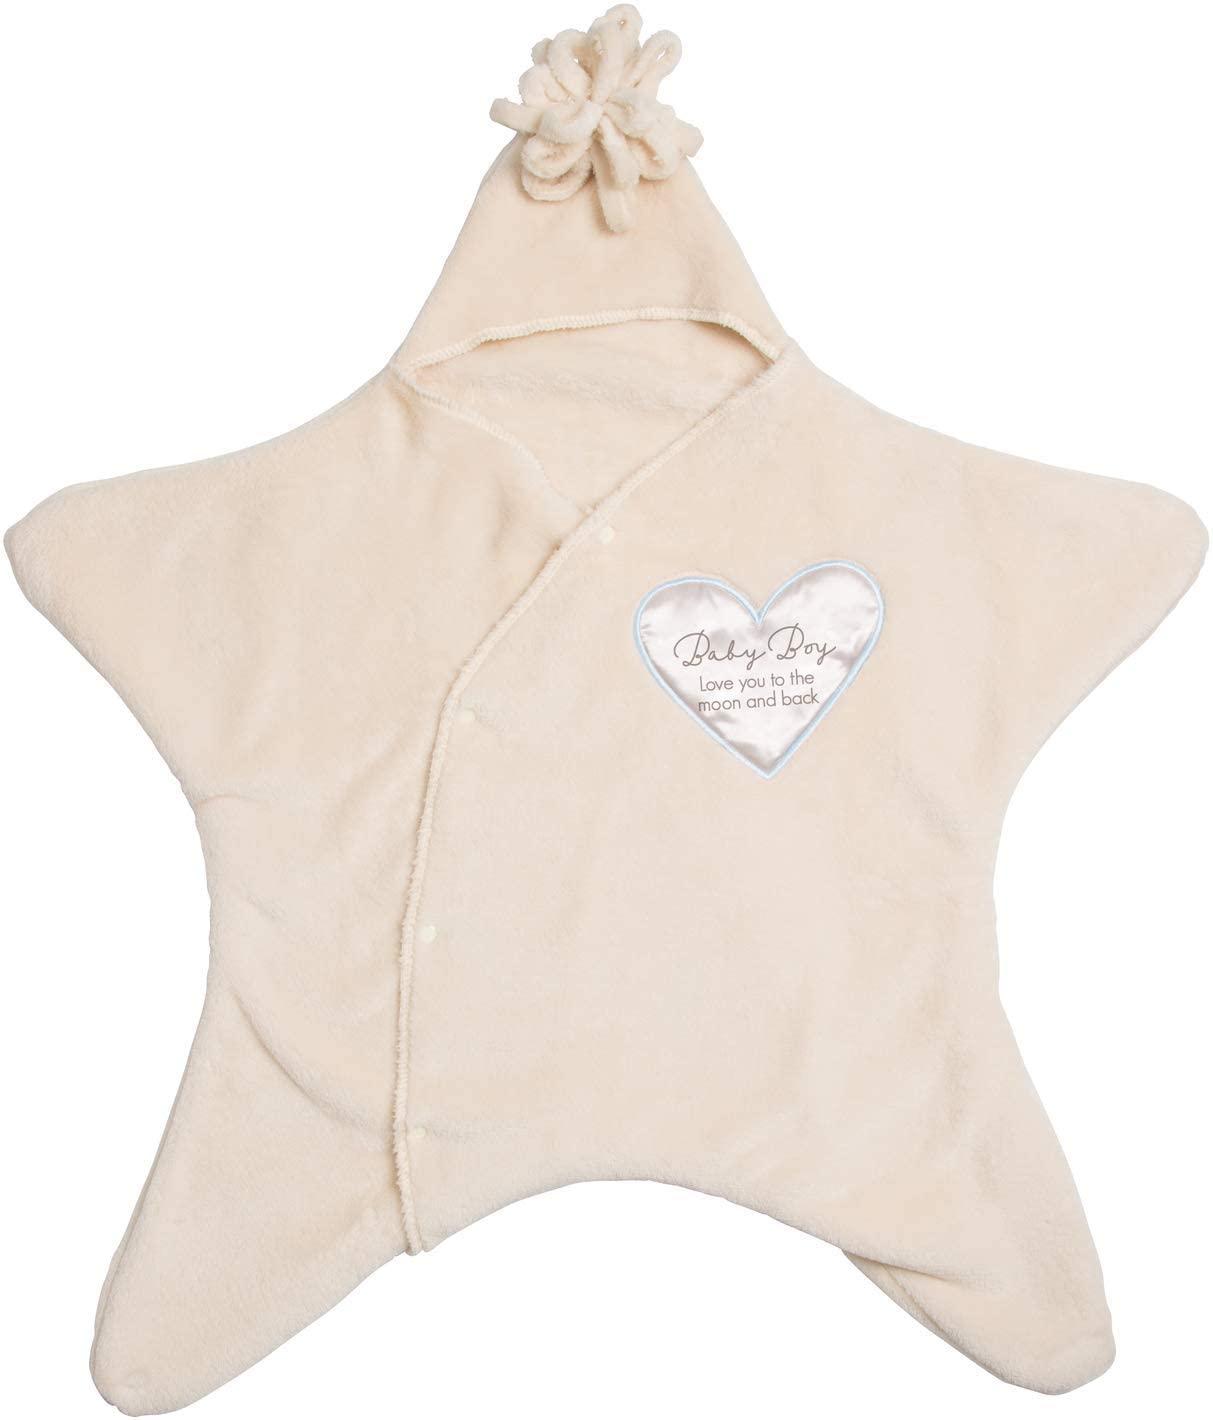 Pavilion Gift Company Baby Boy I Love You Blanket Swaddle